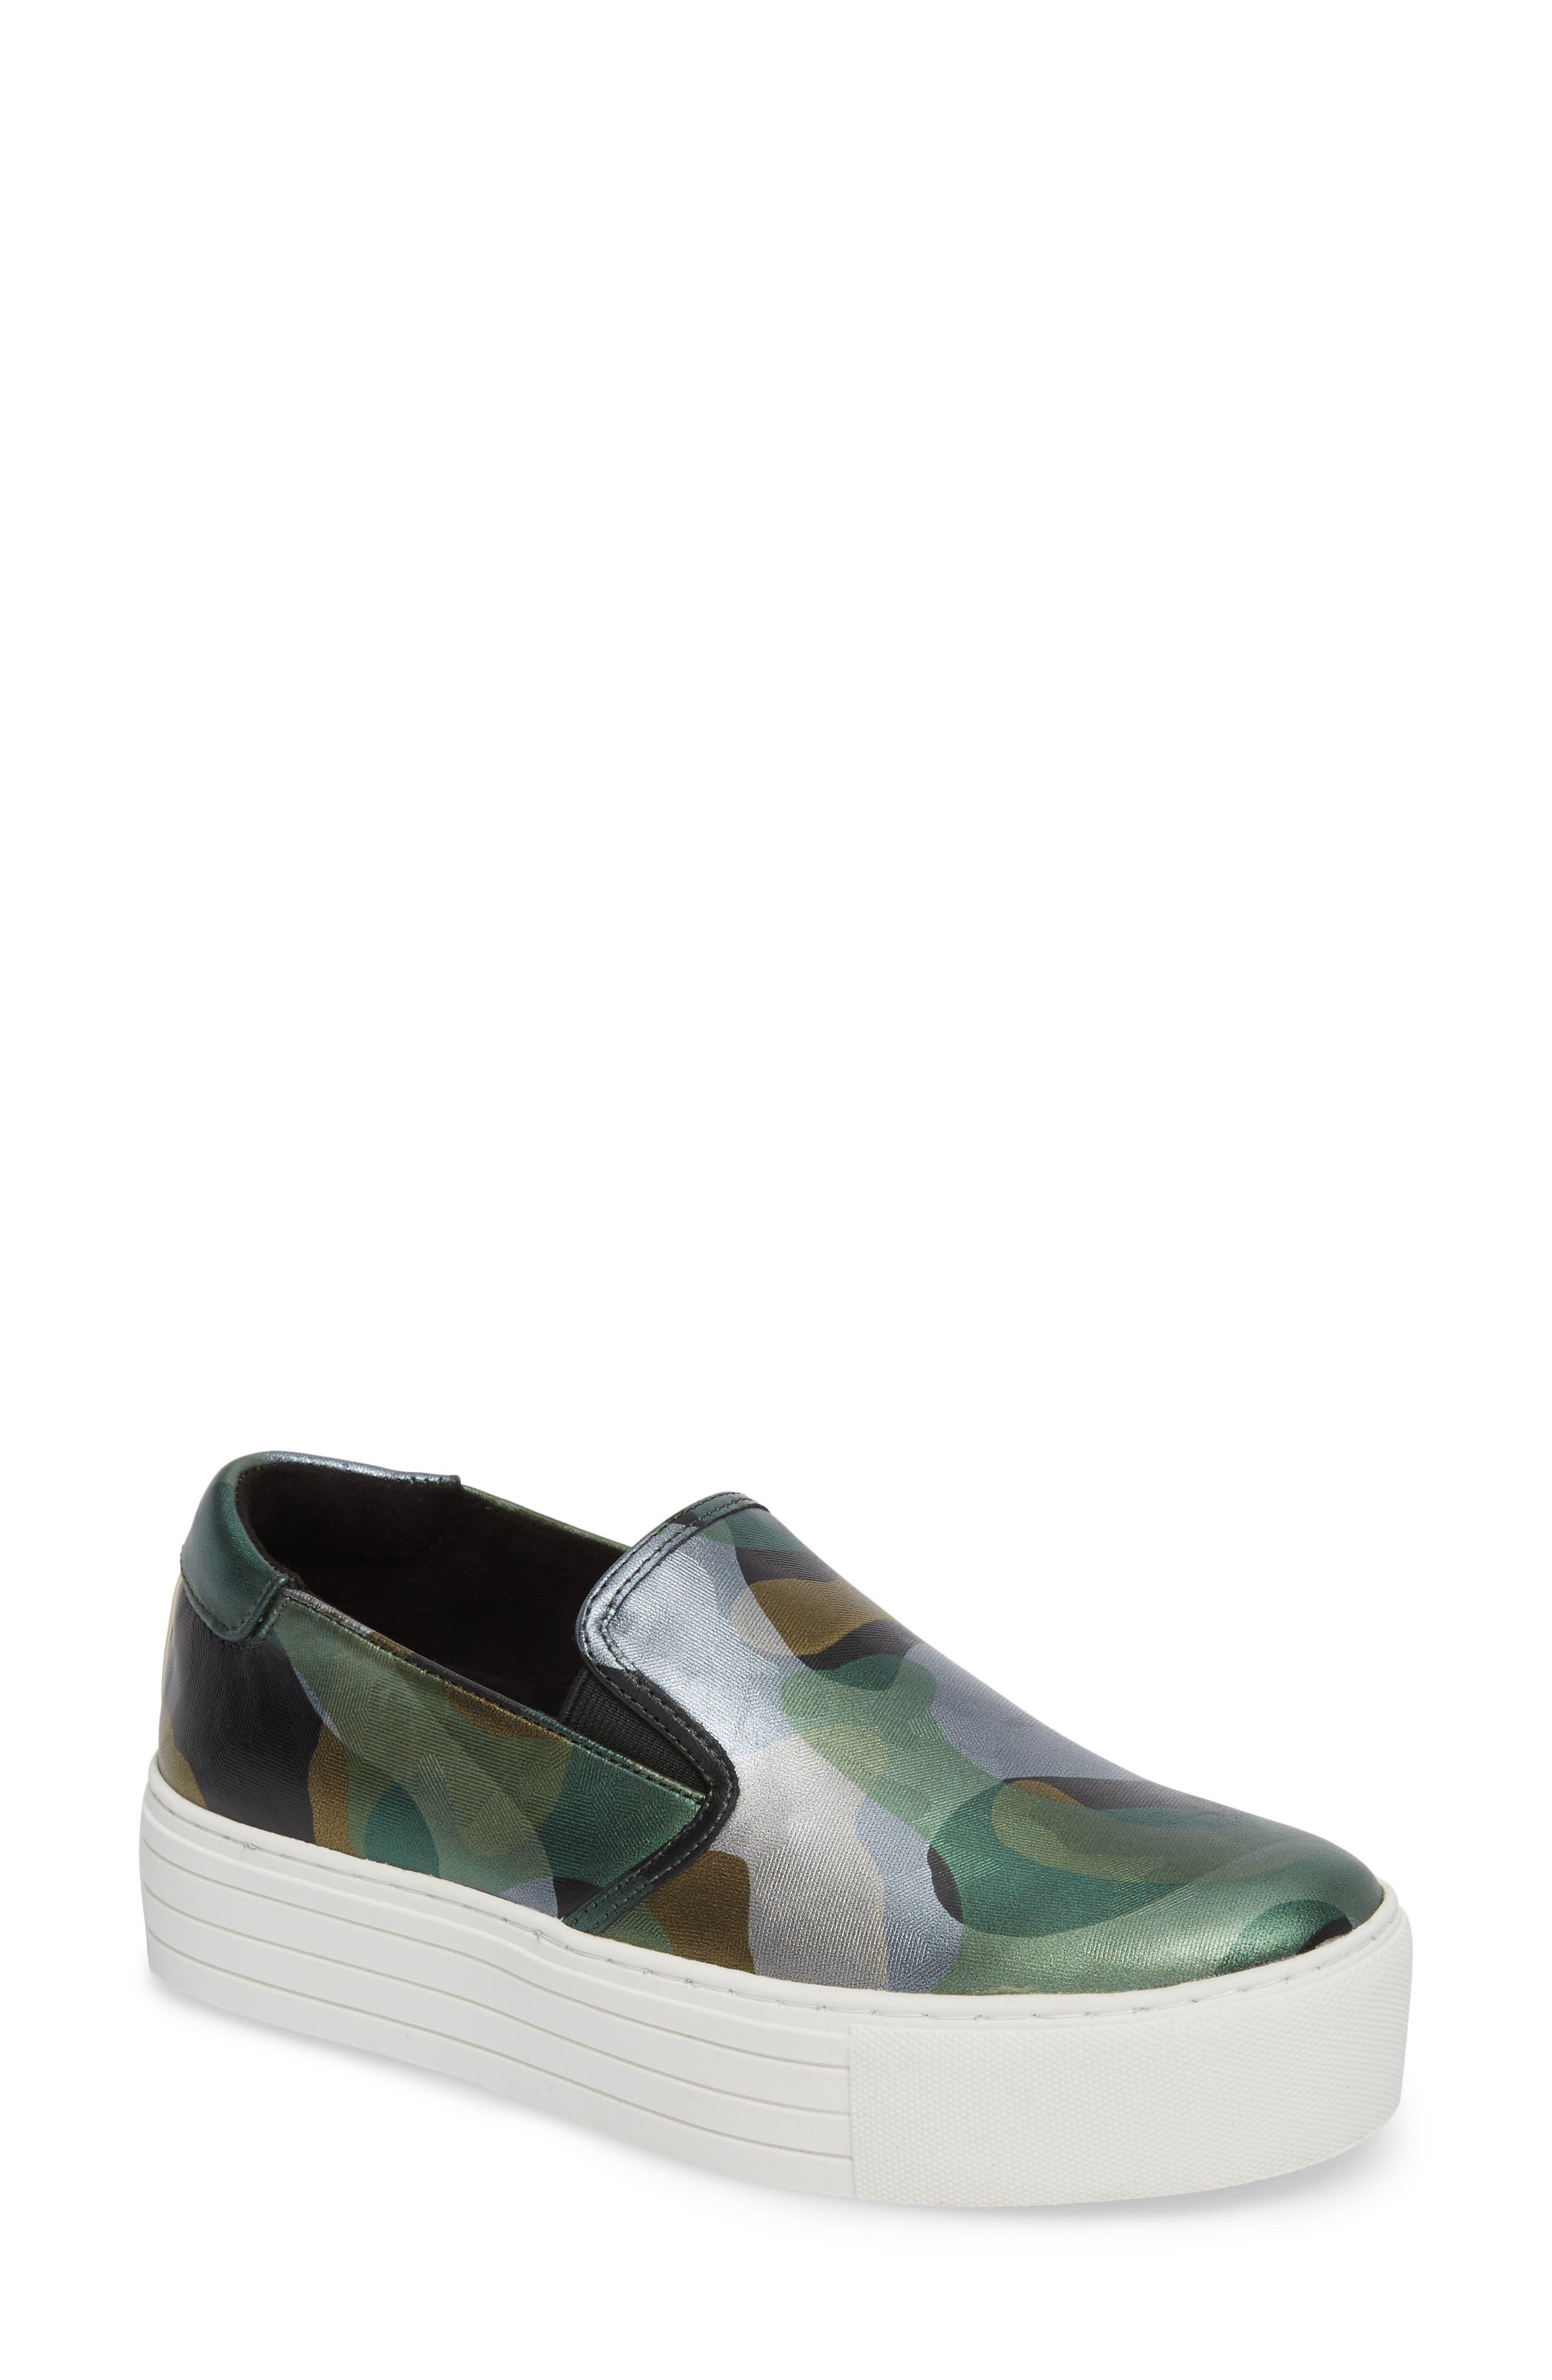 Alternate Image 1 Selected - Kenneth Cole New York Joanie Slip-On Platform Sneaker (Women)